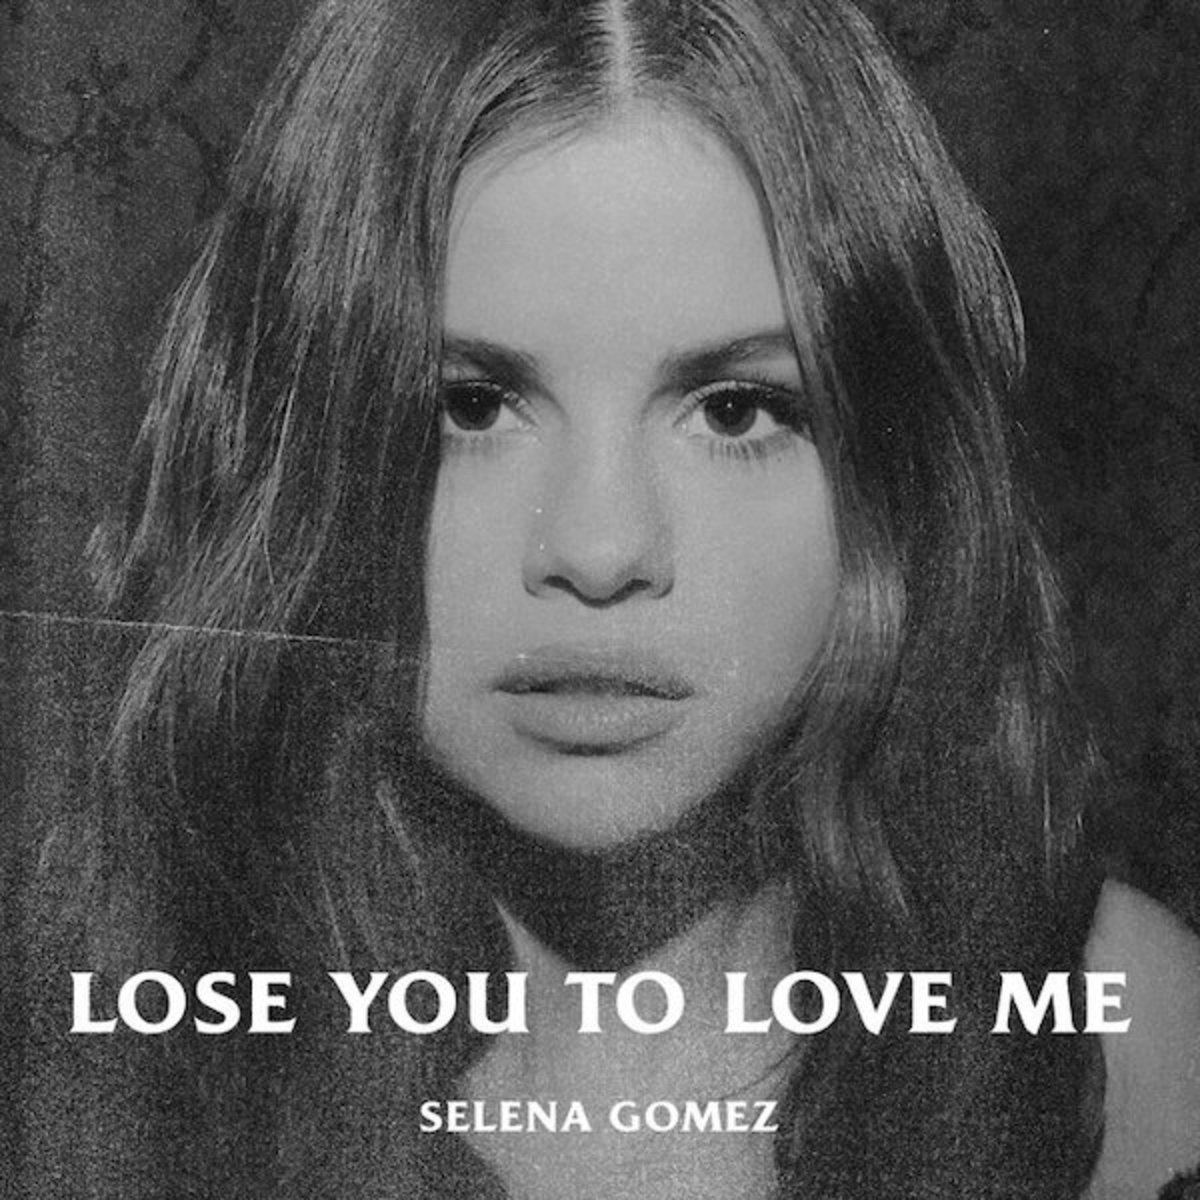 Resultado de imagem para selena gomez lose you to find me[